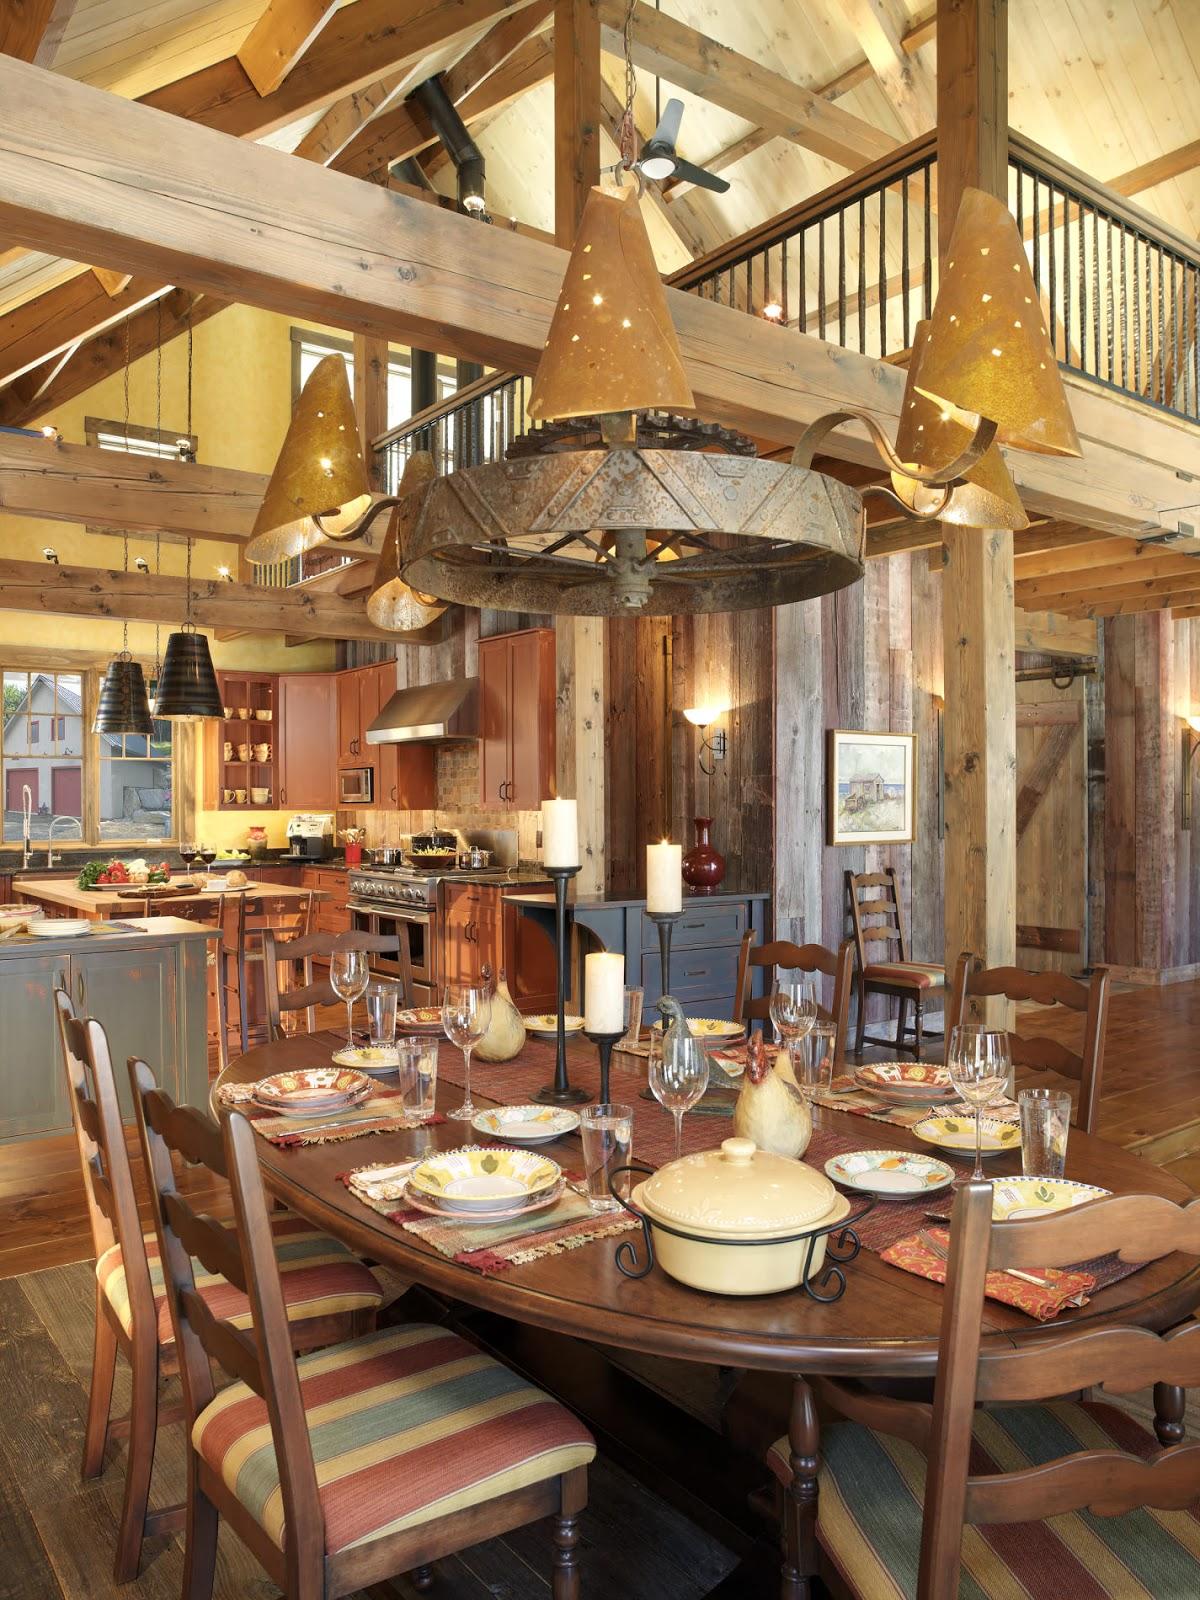 country dining room lighting. Interiornity |source Of Interior Design Ideas \u0026 Inspirational Homes Country Dining Room Lighting